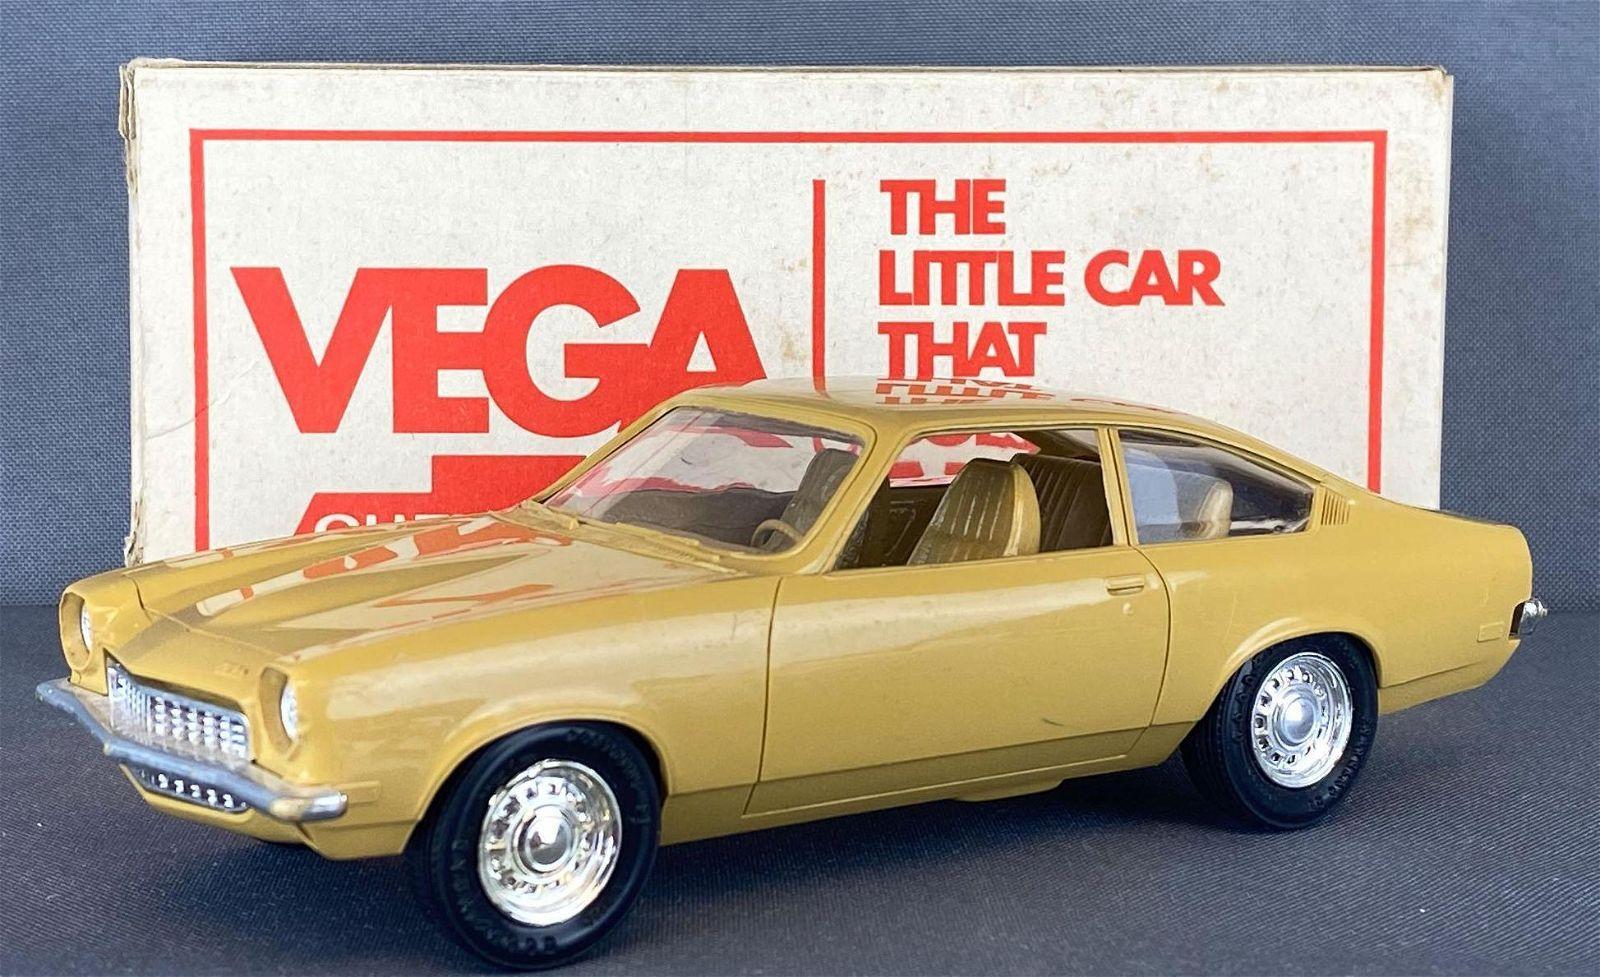 1973 Chevrolet Vega Dealer Promo Car